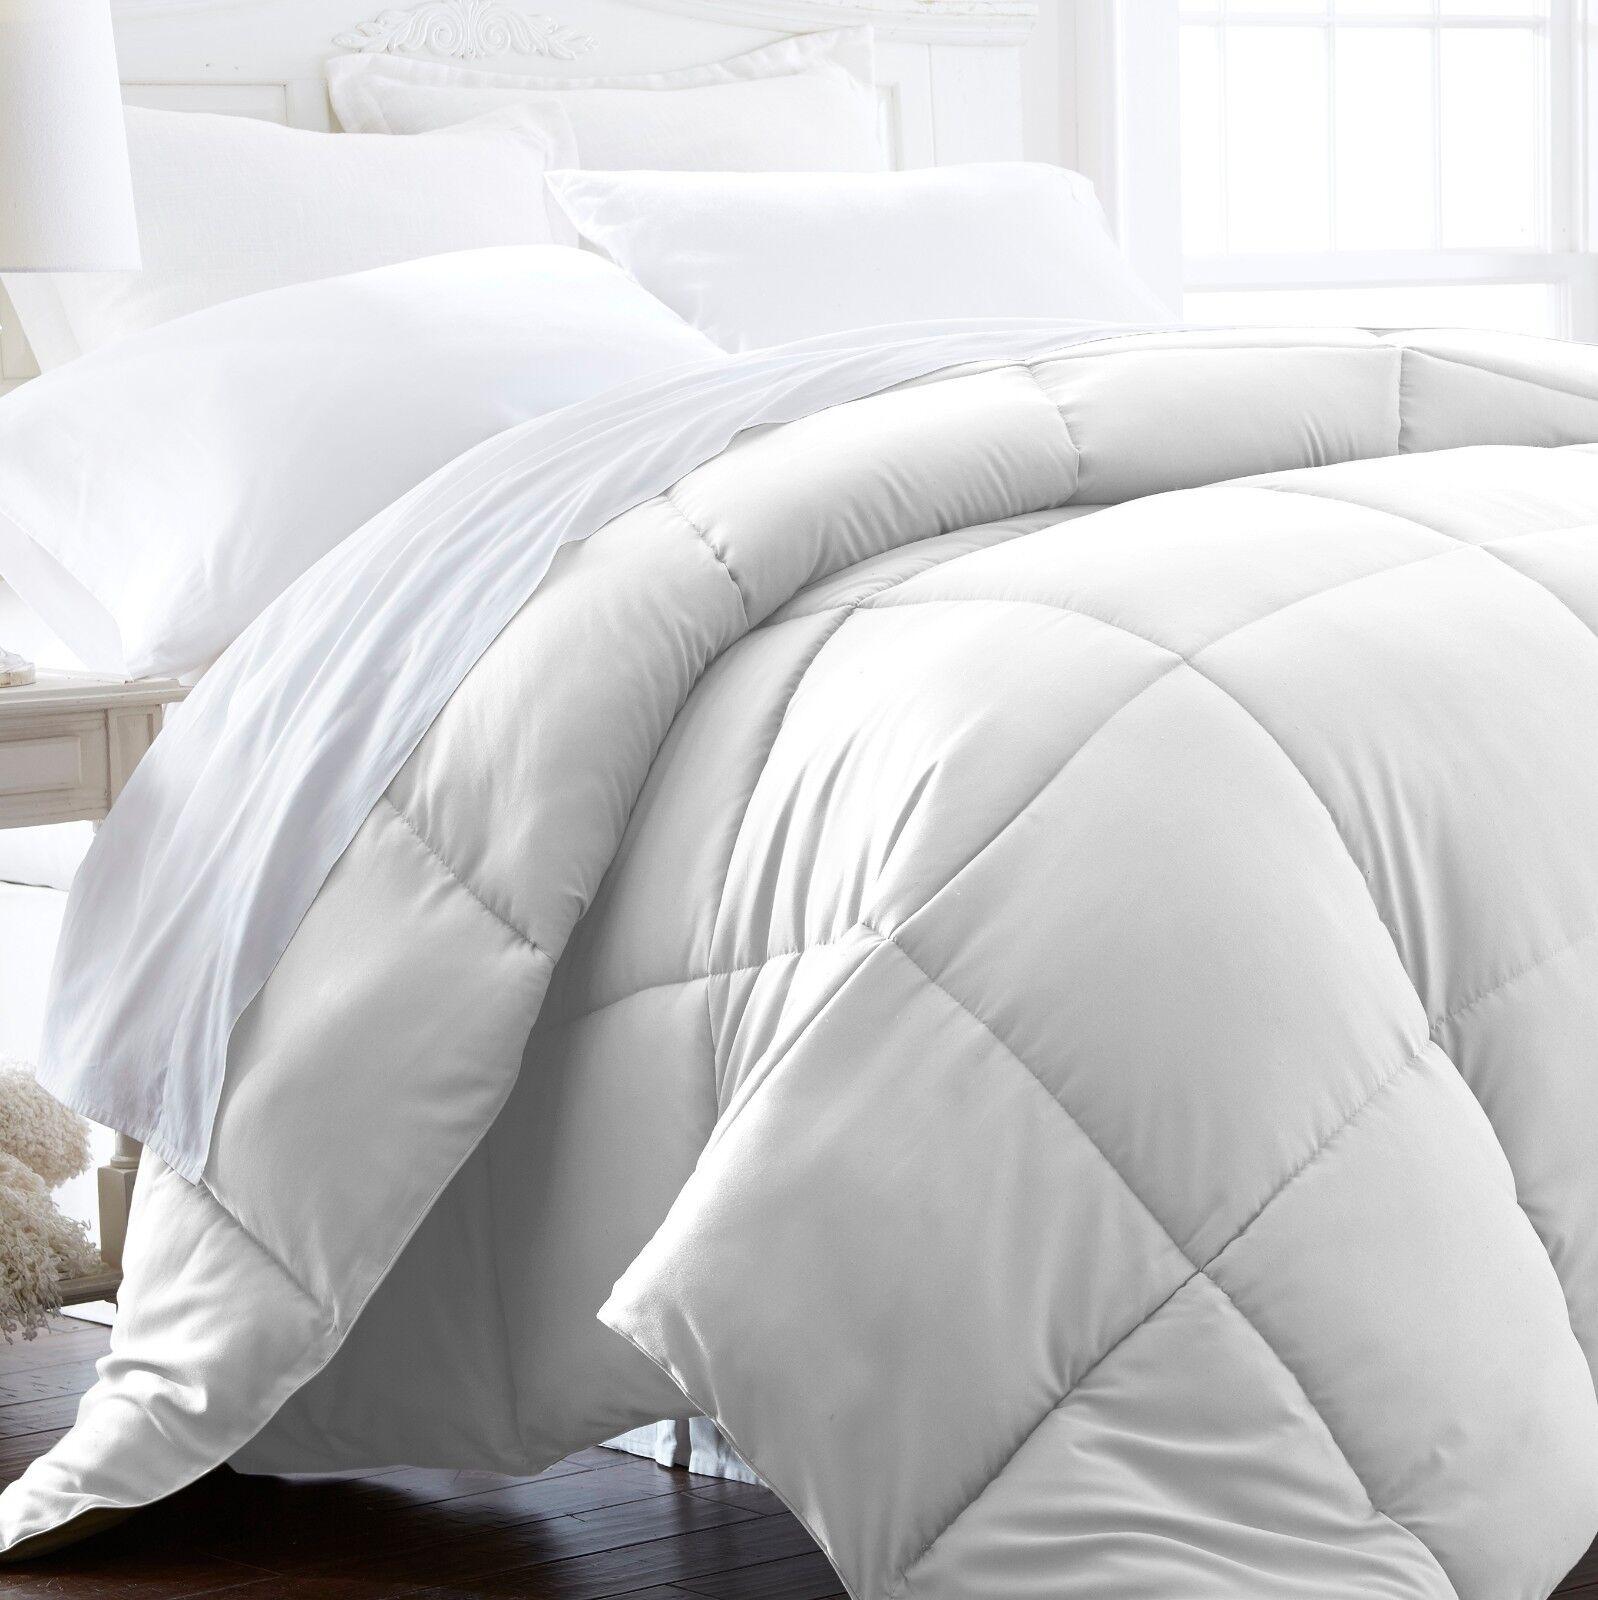 Ultra Soft Premium Goose Down Alternative Comforter - 6 Classic Colors